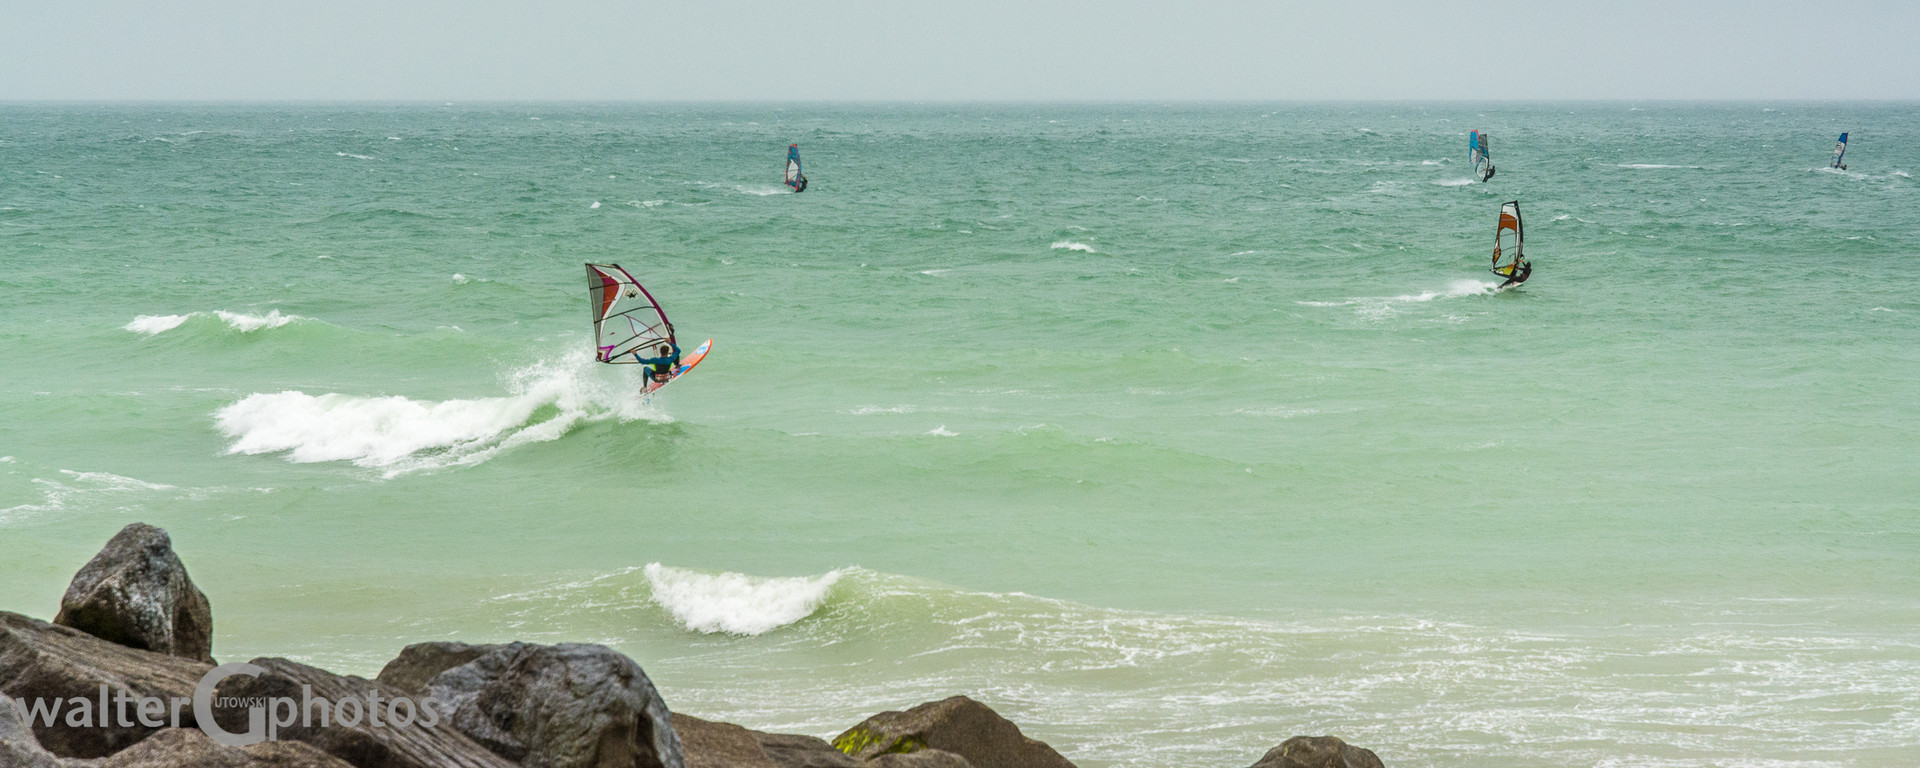 Windsurfing off Shoreham-by-Sea, England